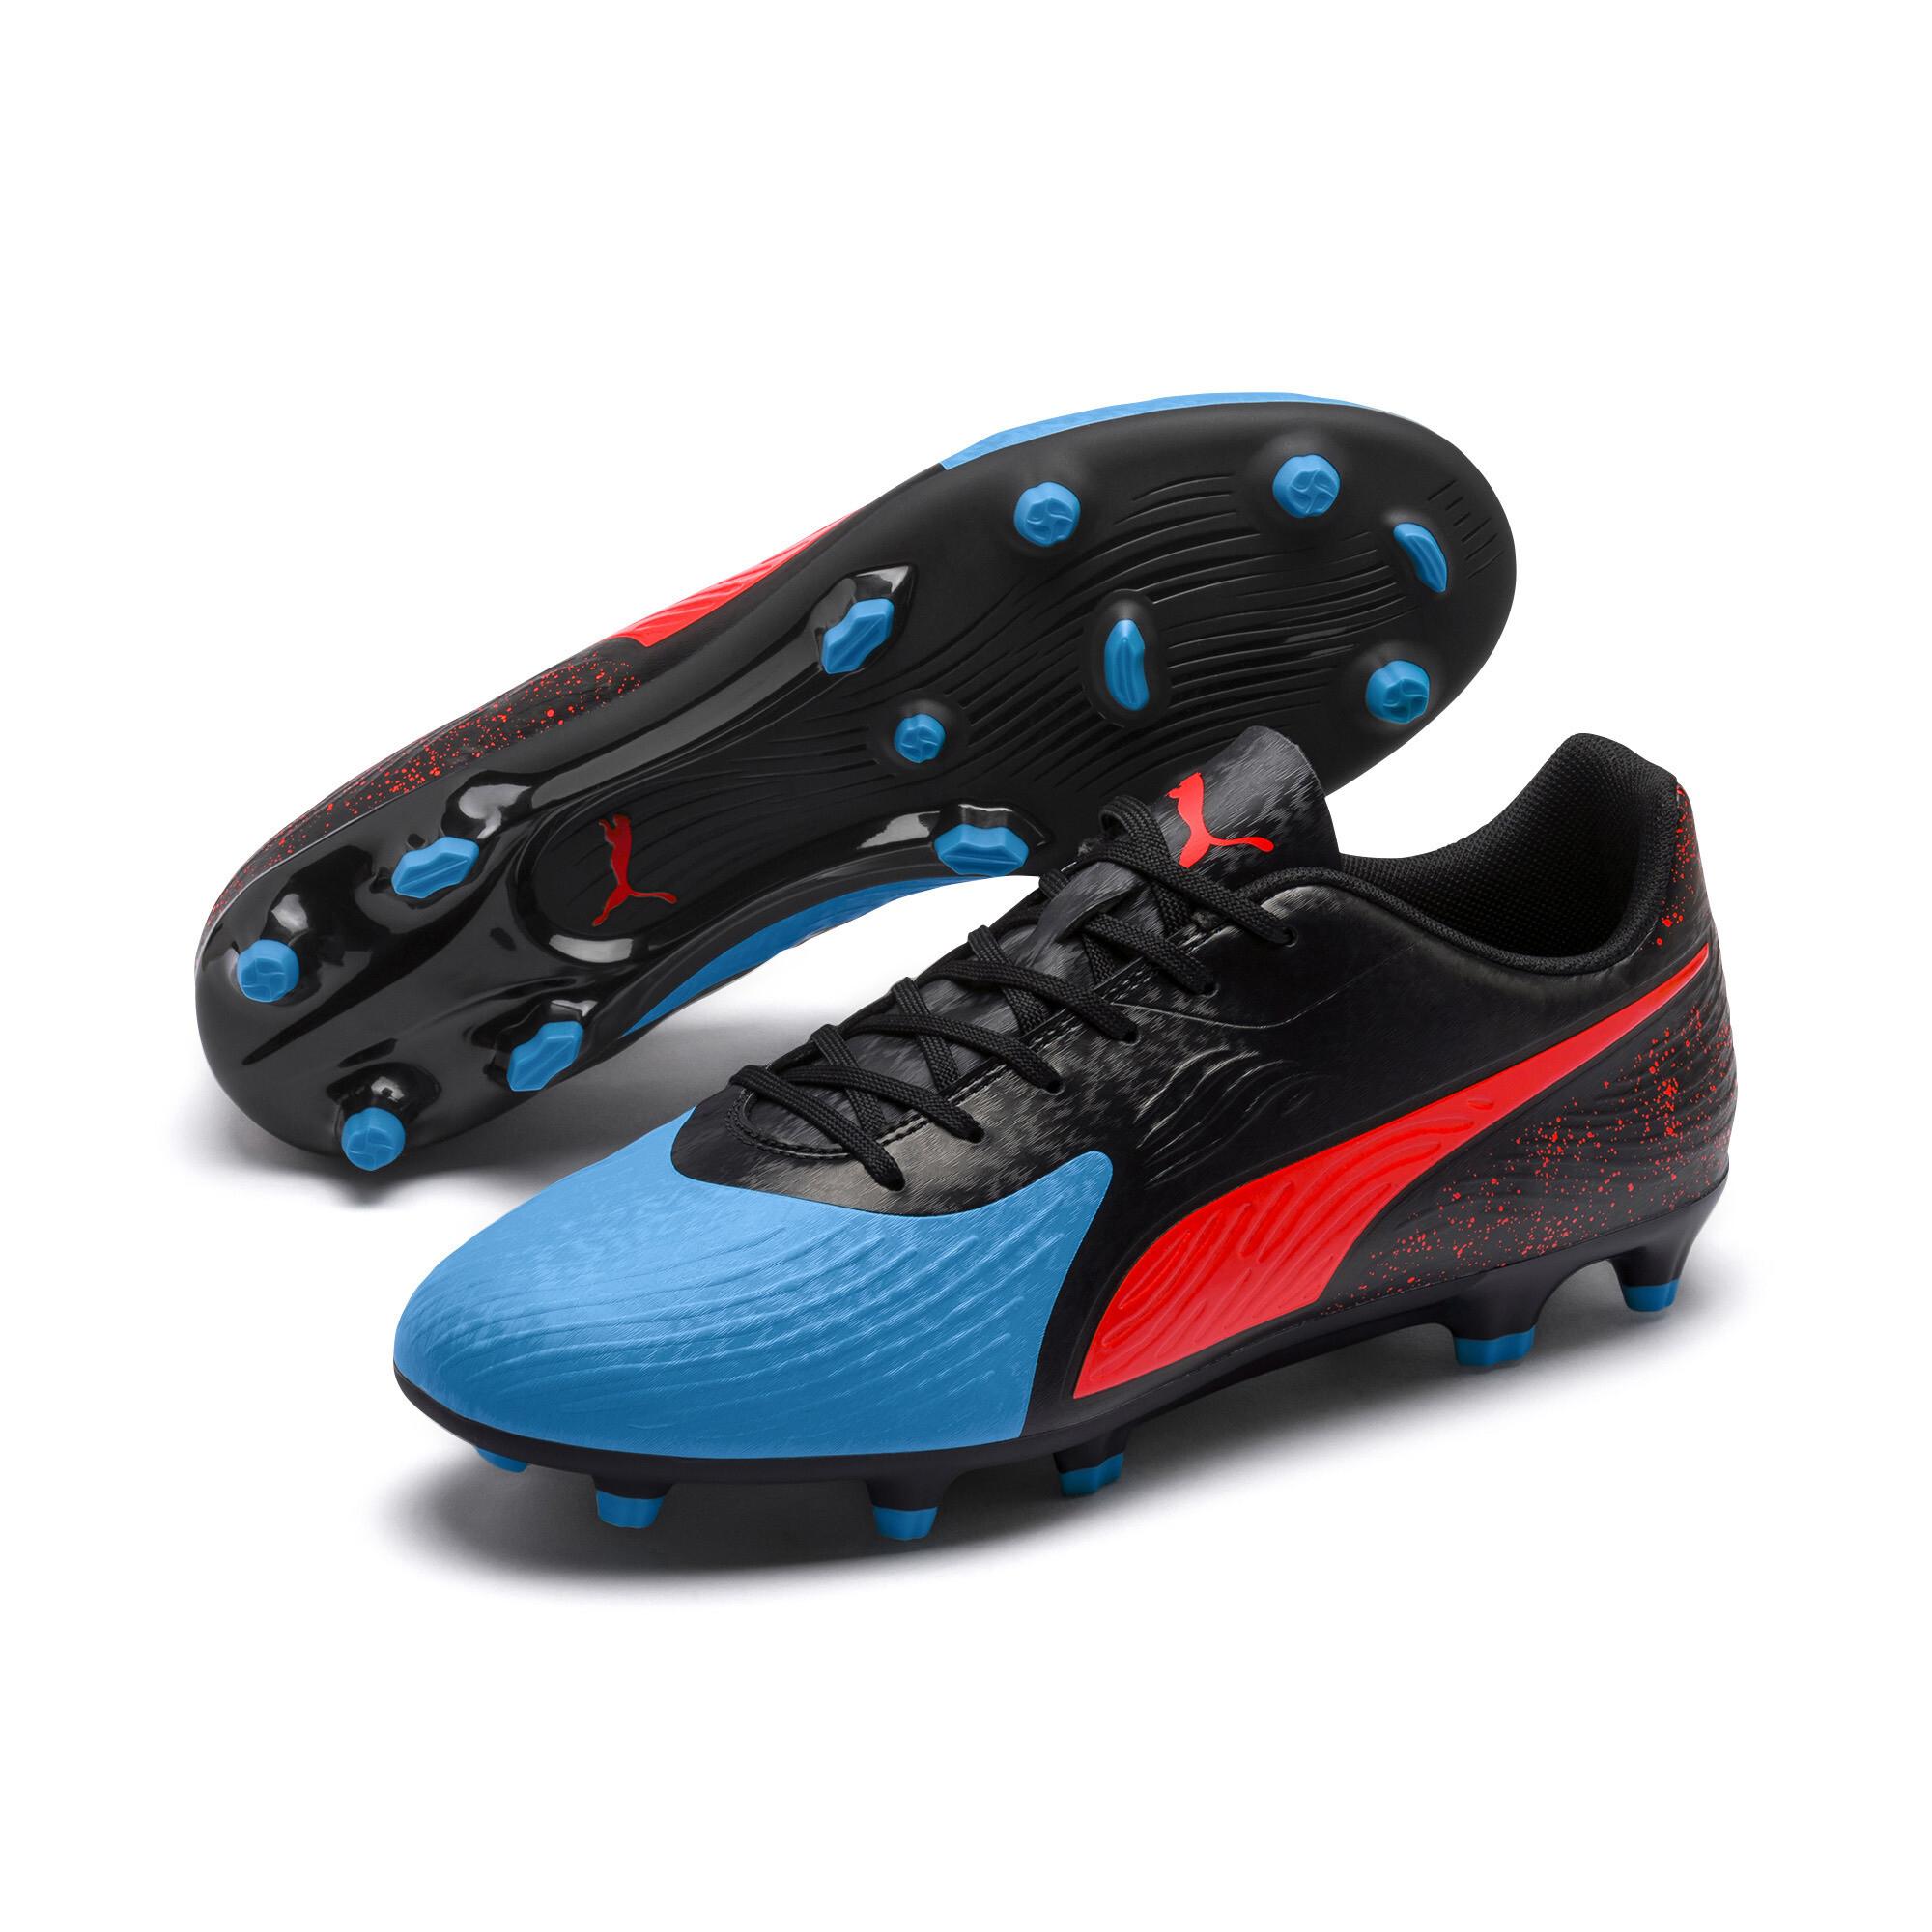 Image Puma PUMA ONE 19.4 FG/AG Men's Football Boots #2